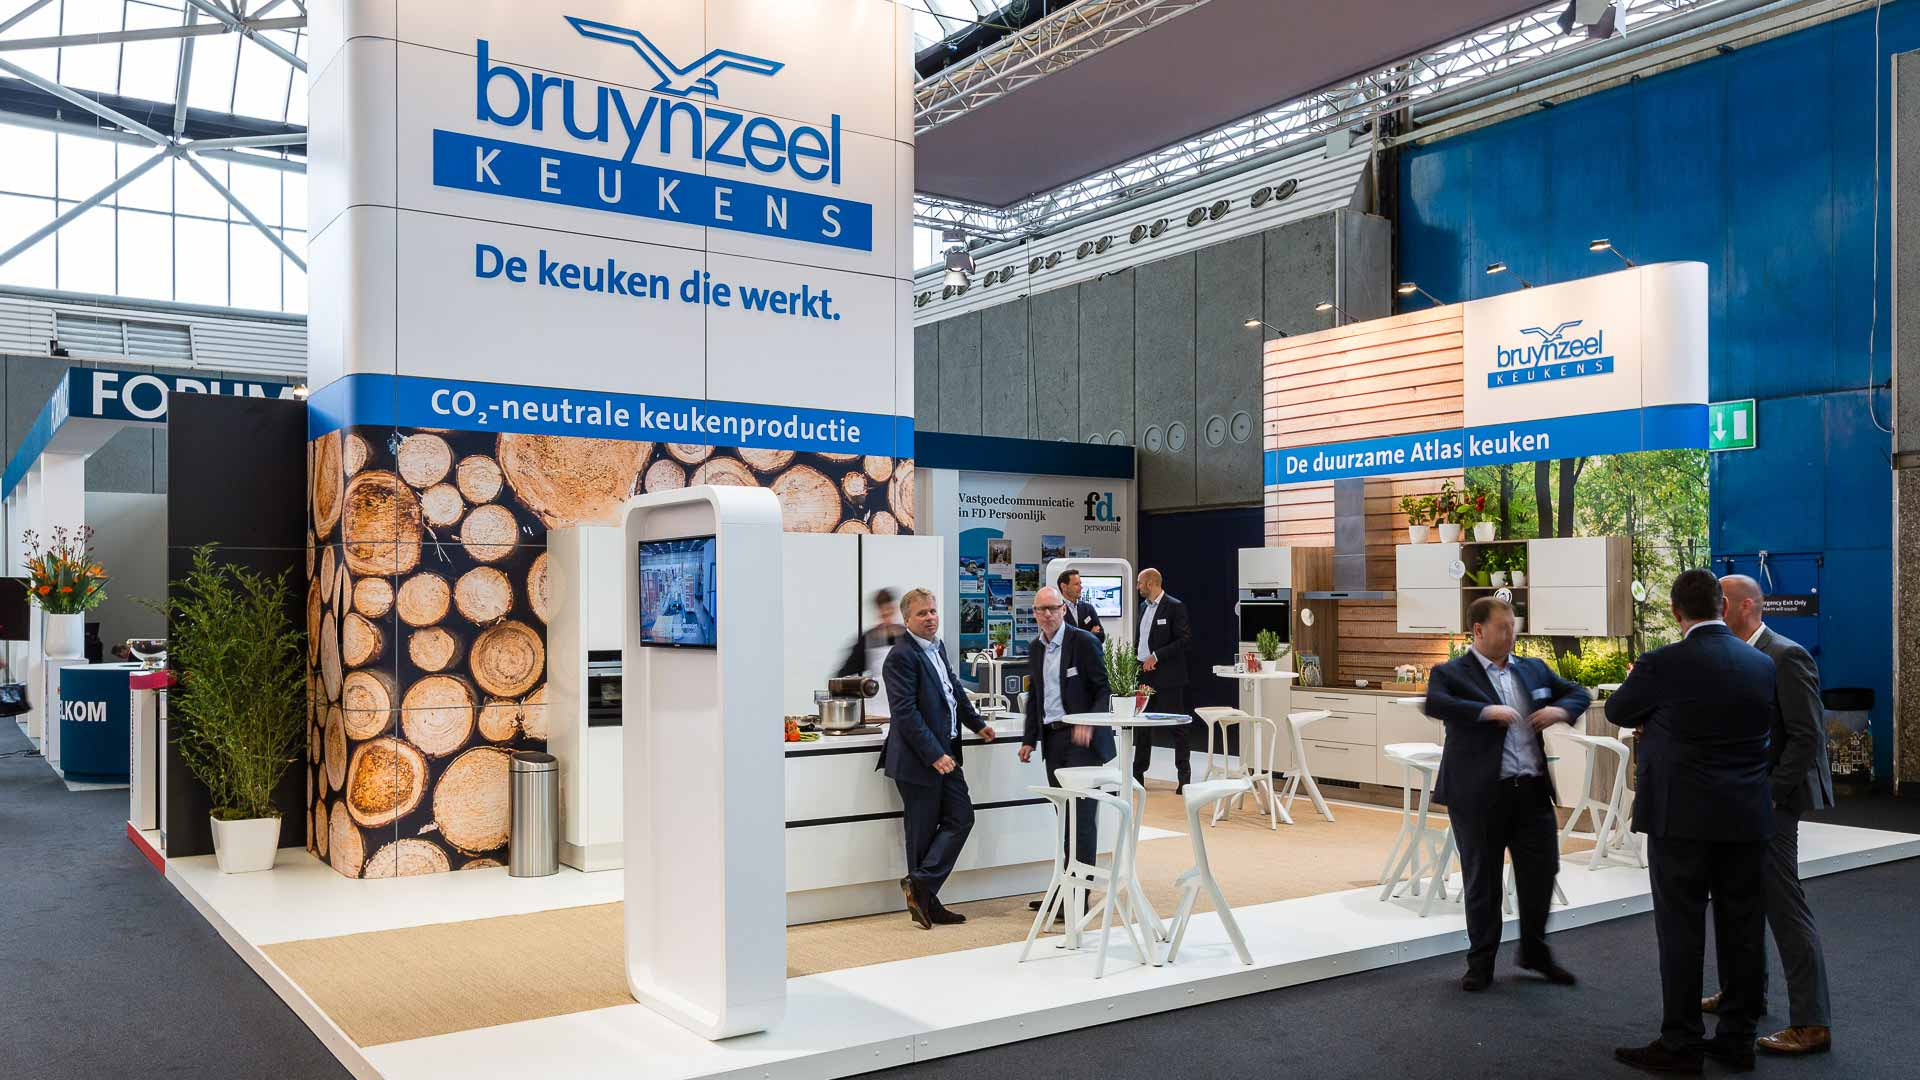 Bruynzeel kitchens provada expospaces